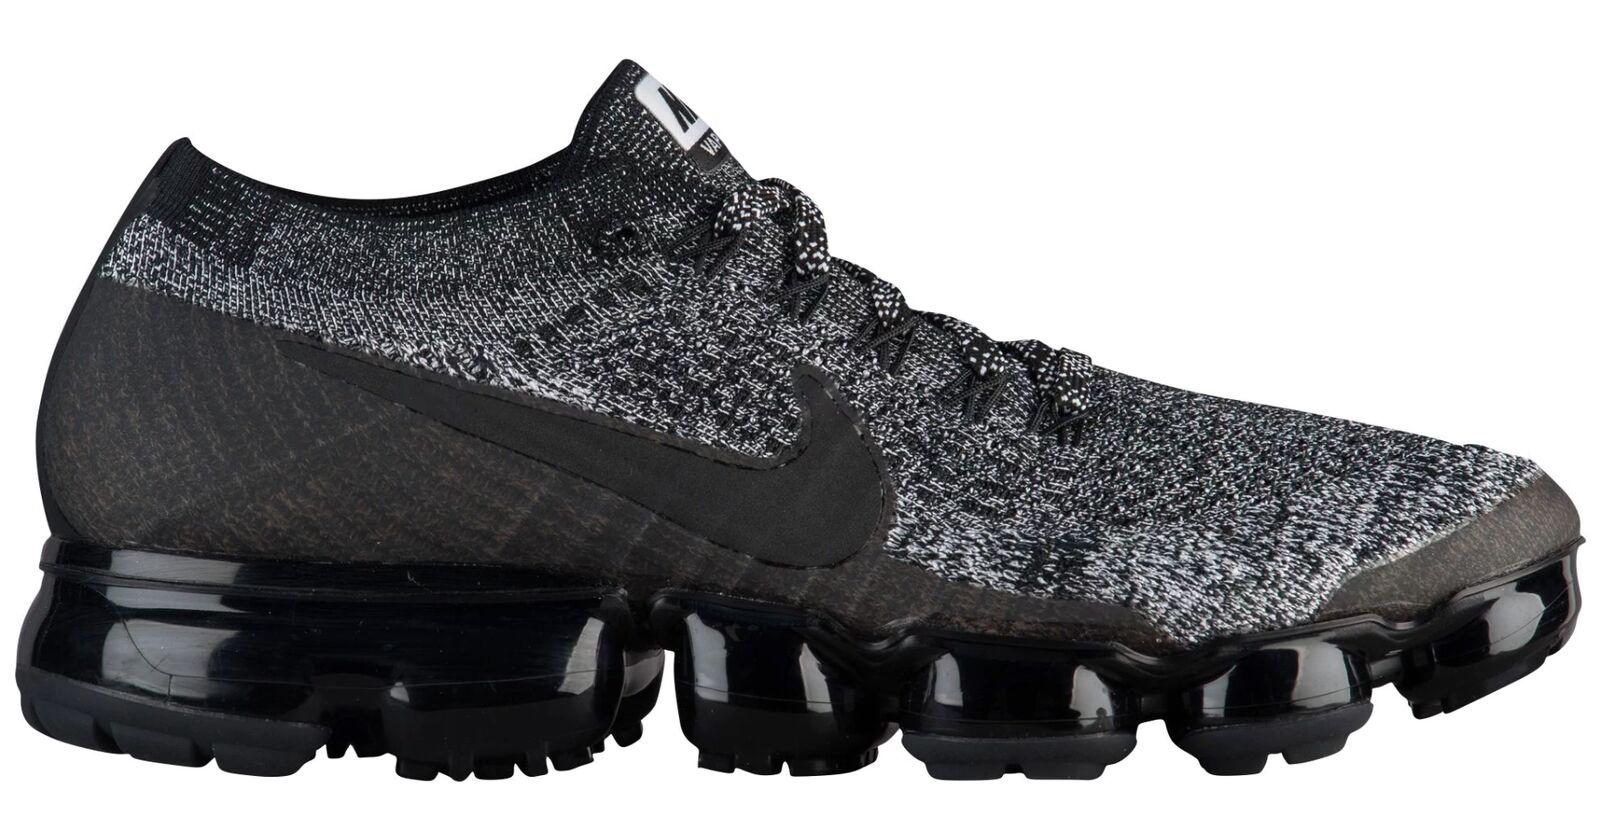 NIKE Womens Nike Air Vapormax Flyknit Running 849557-041 BLACK Size 10